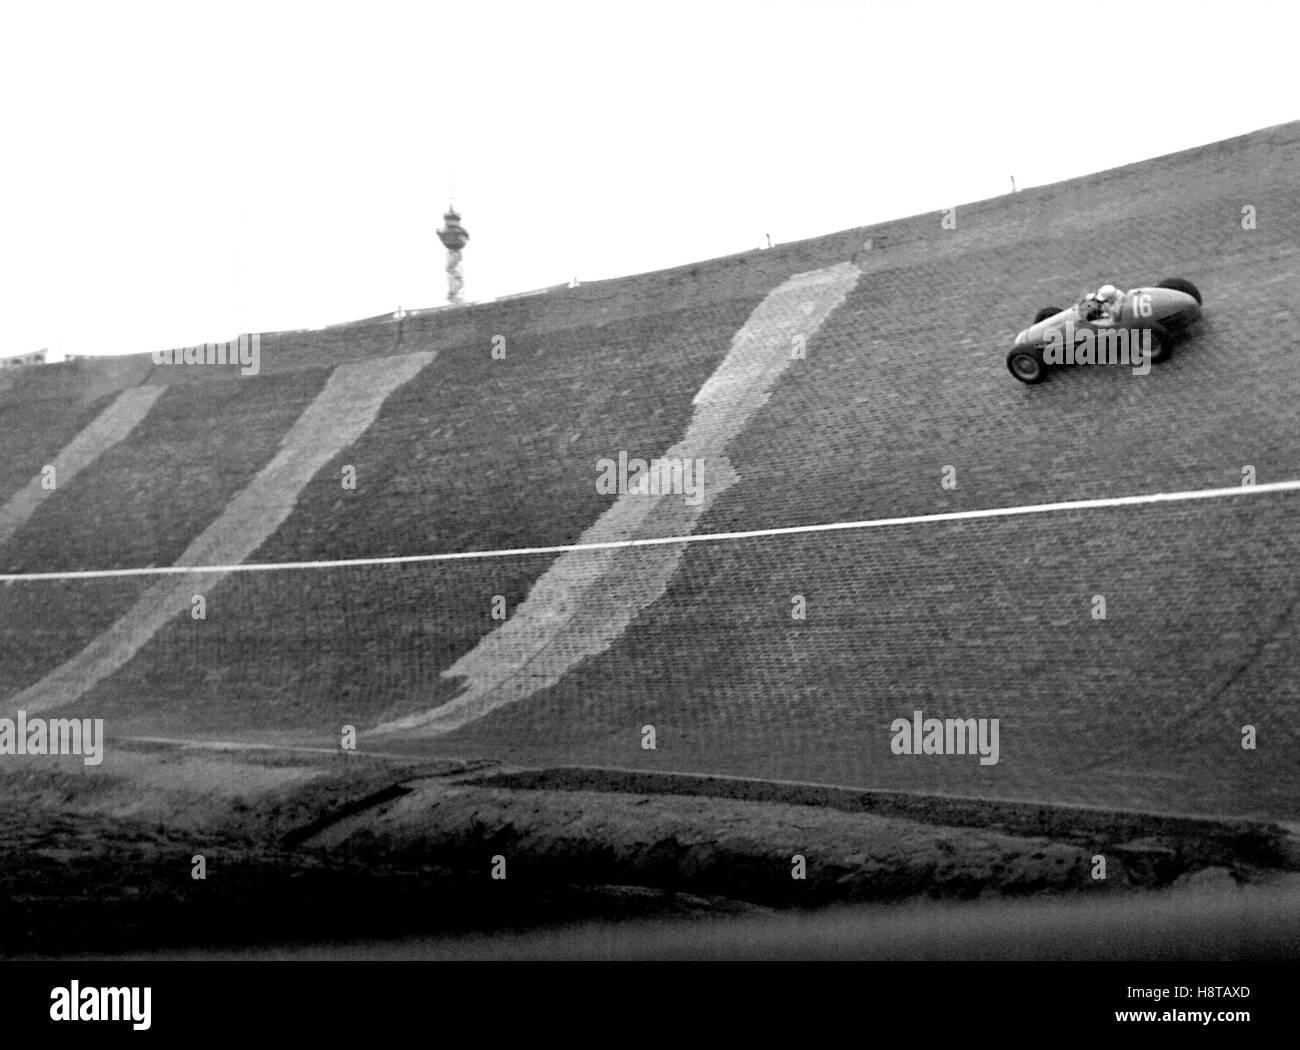 1954 BERLIN GP FRED WACKER GORDINI ON NORTH WALL BANKING - Stock Image